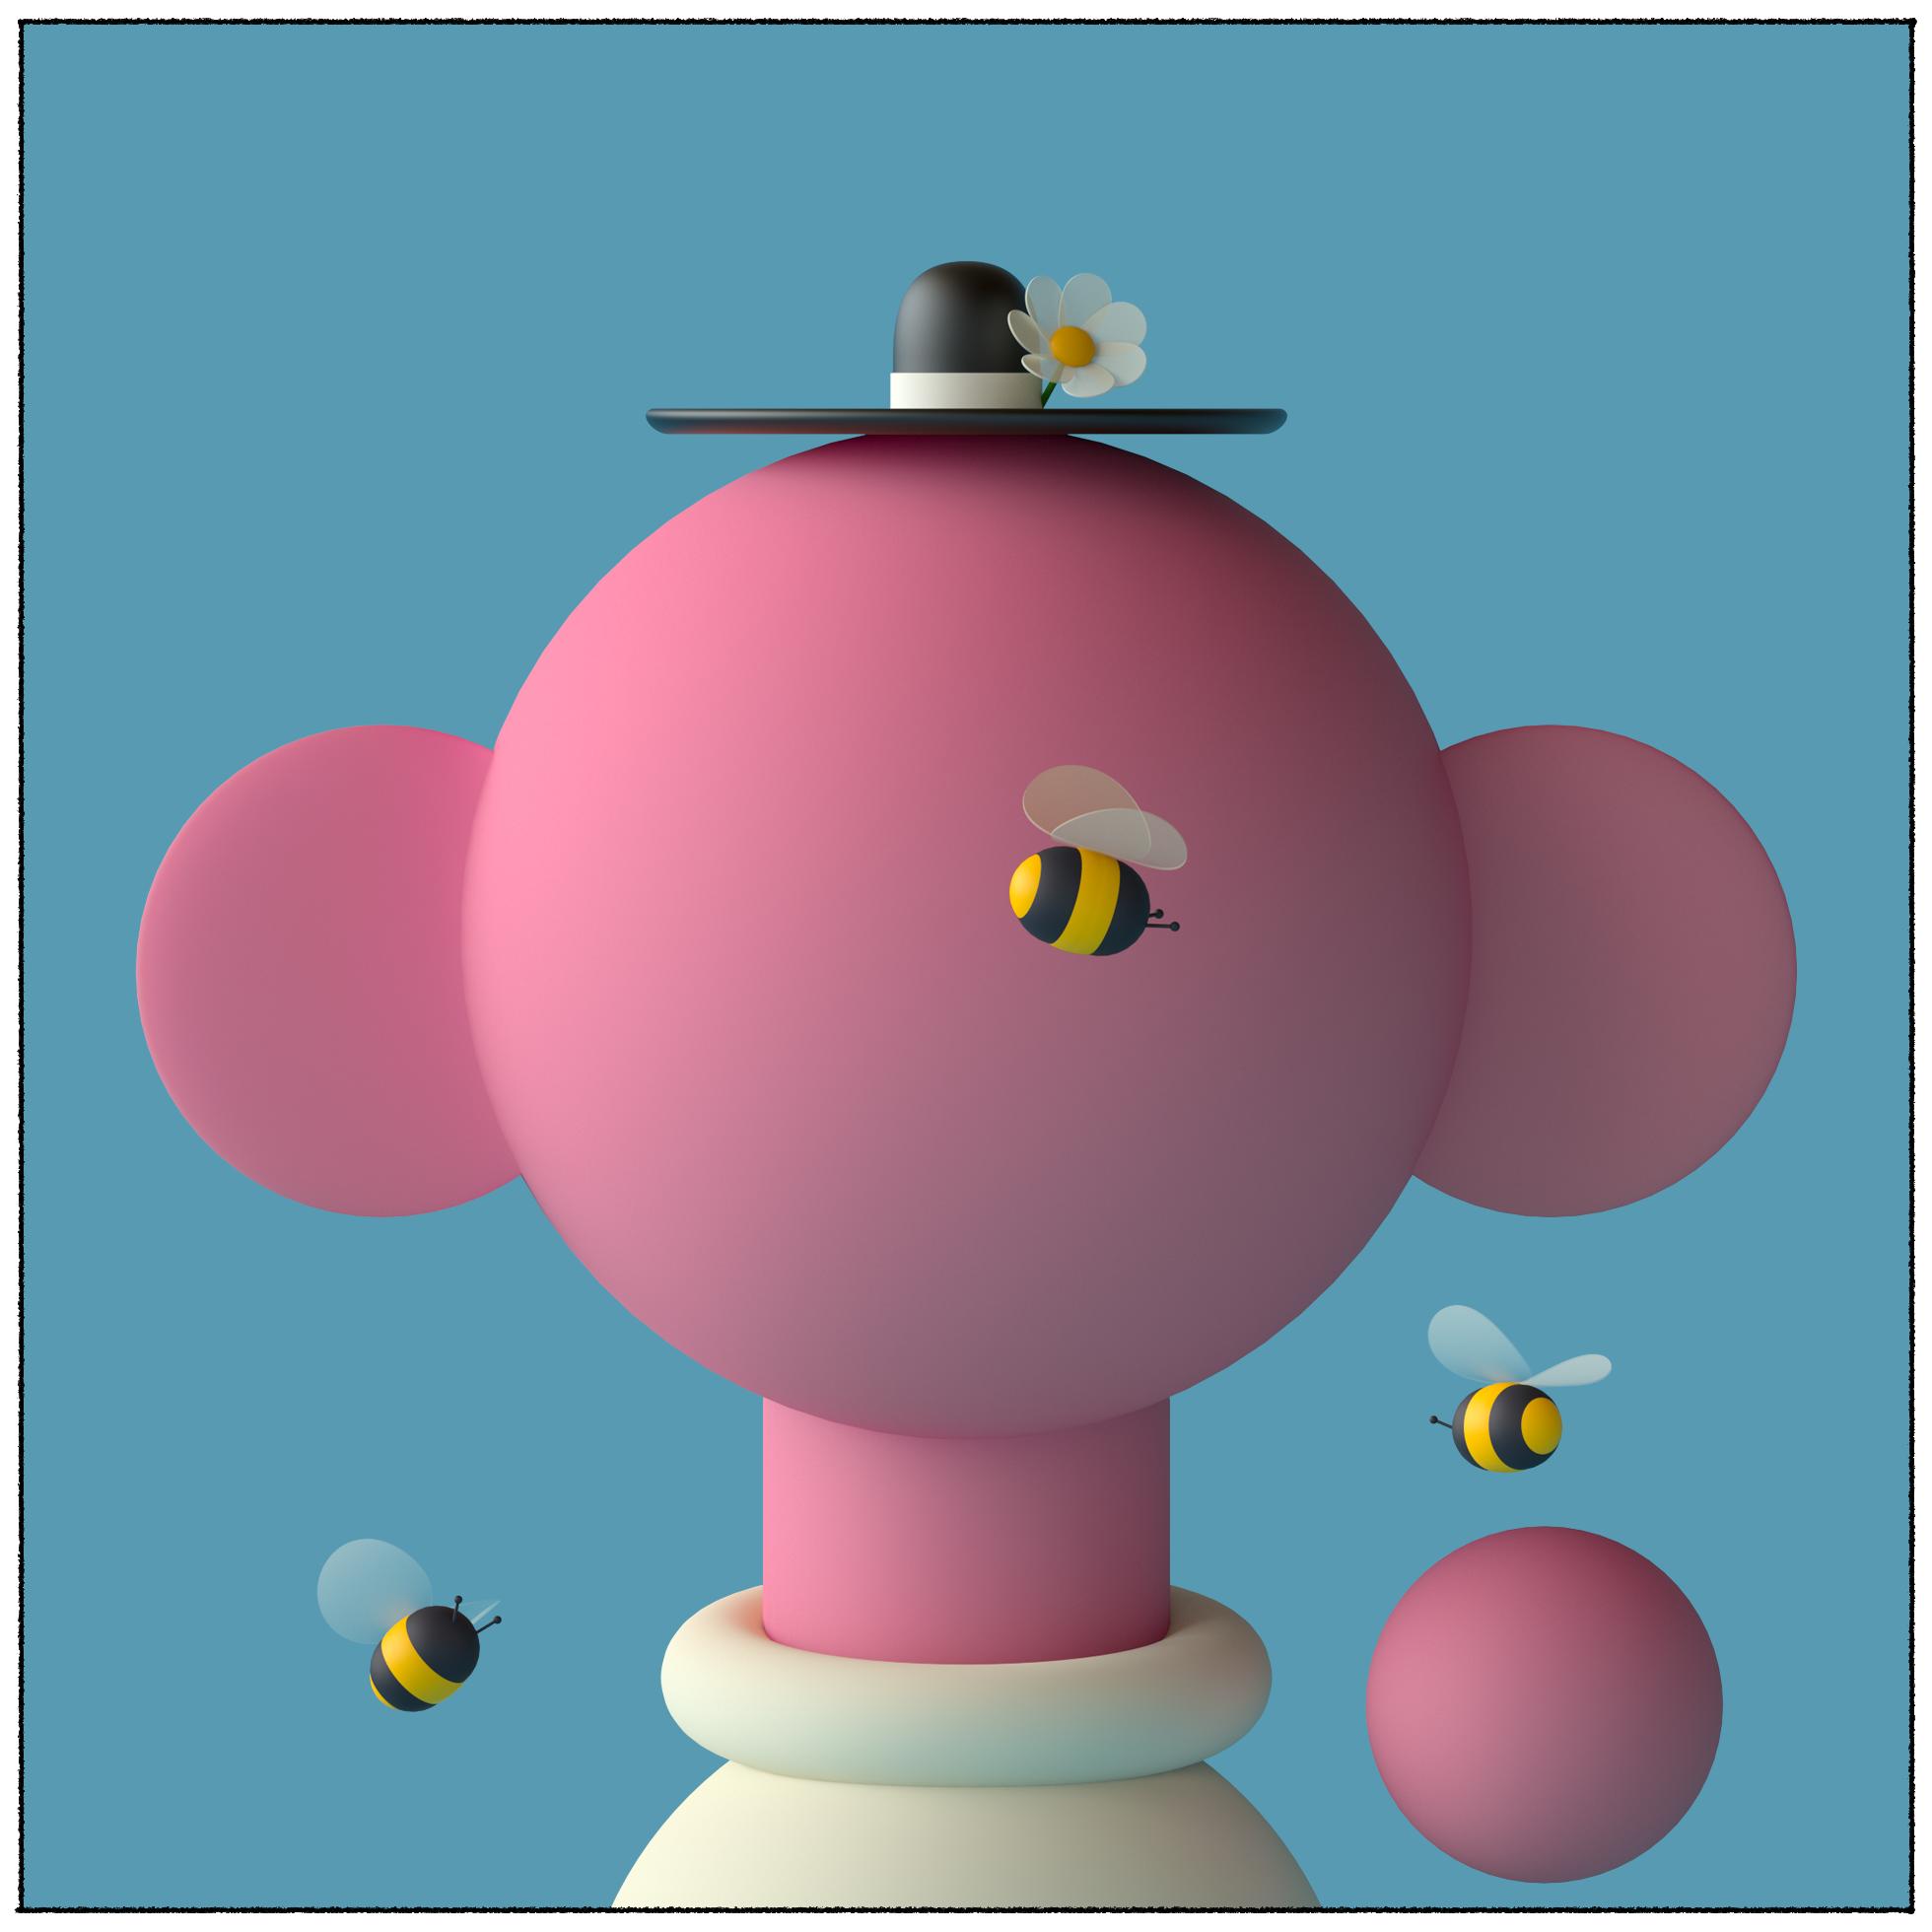 Faceless-bee03.png